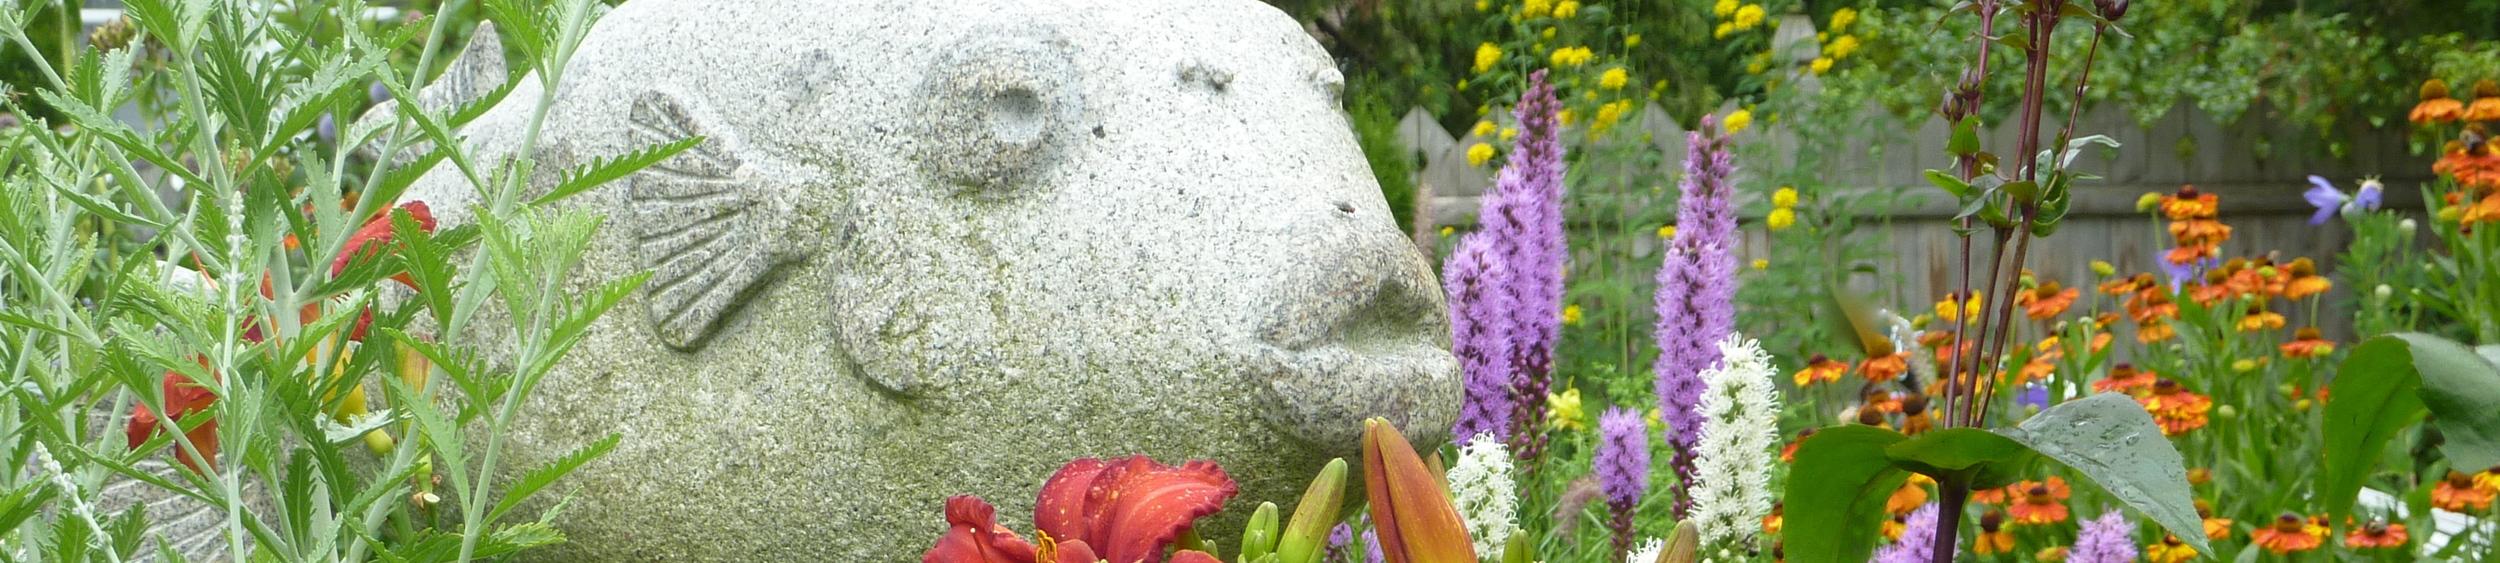 Pufferfish sculpture by Thomas Berger, Green Art, Kittery, ME